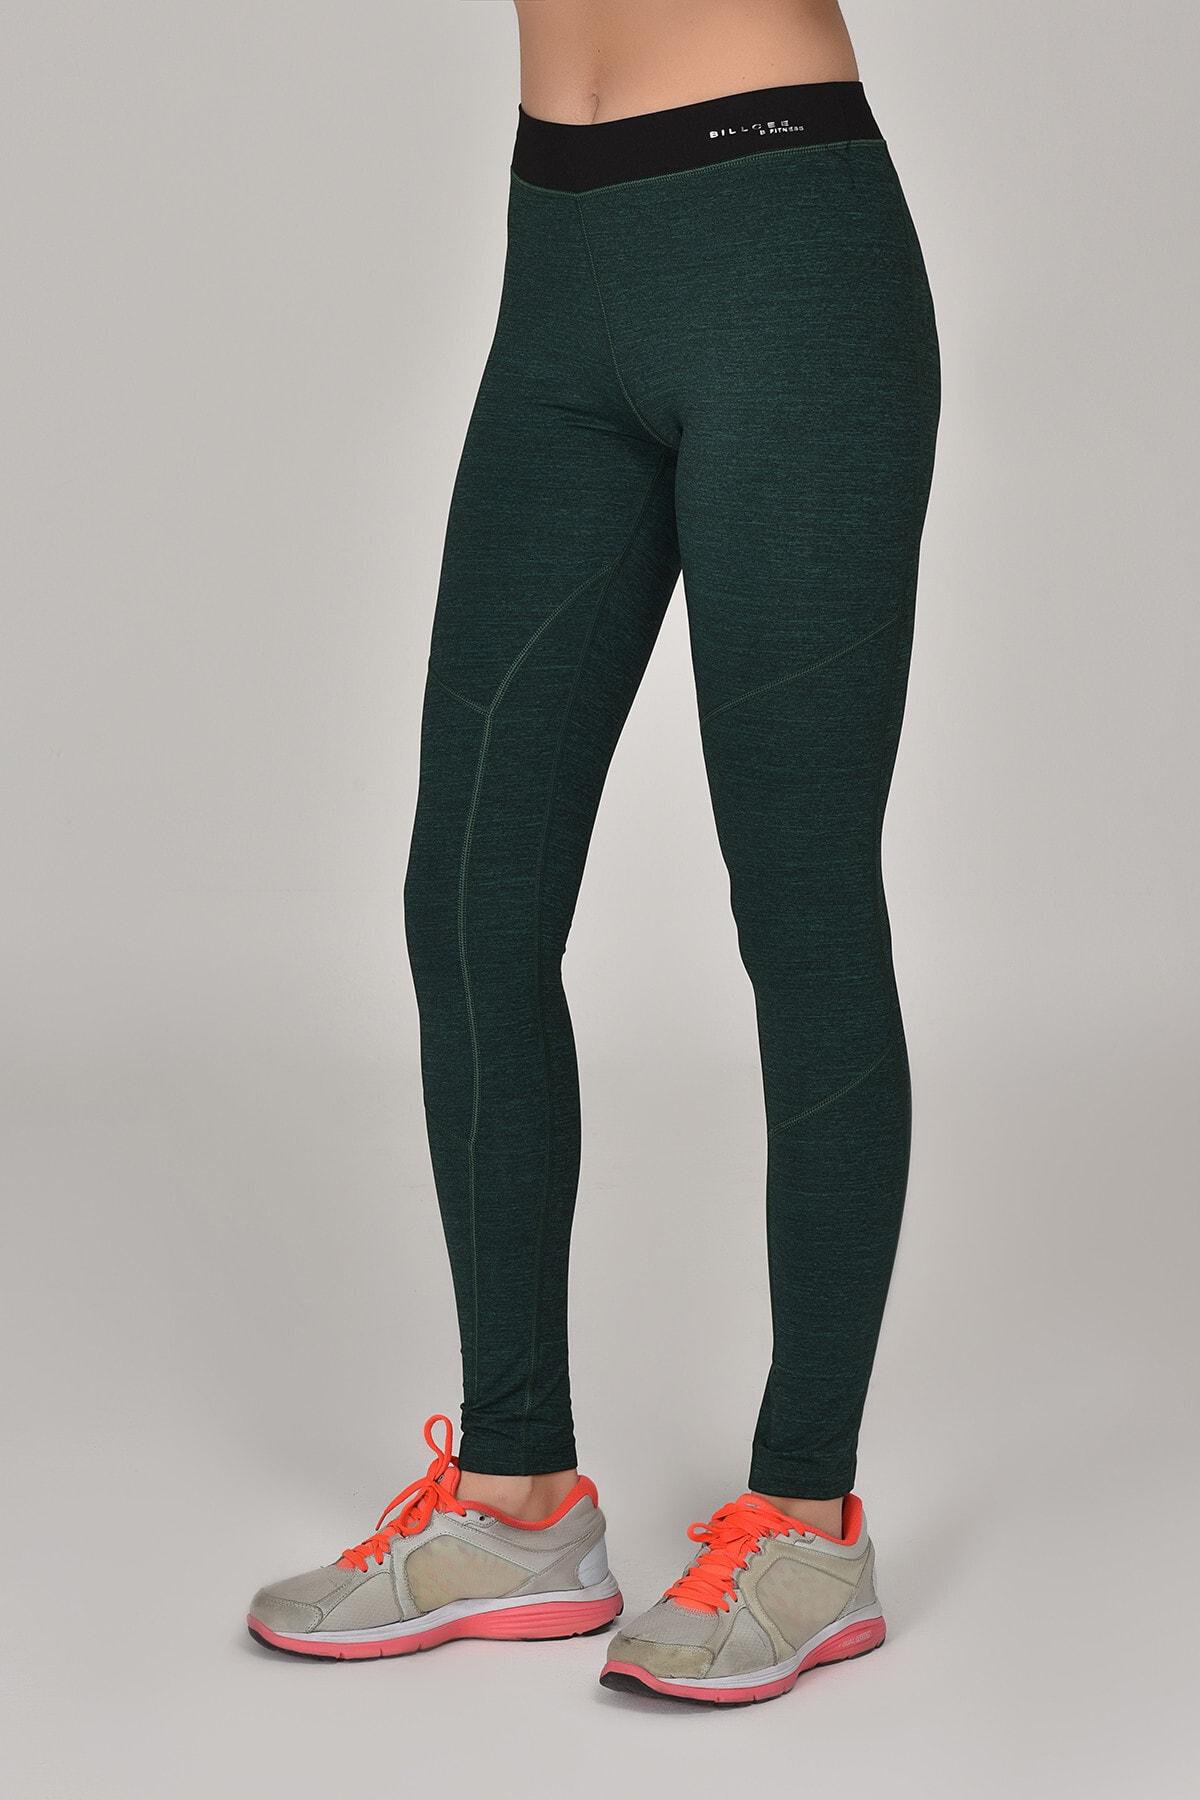 bilcee Yeşil Kadın Sporcu Tayt AW-6571 2